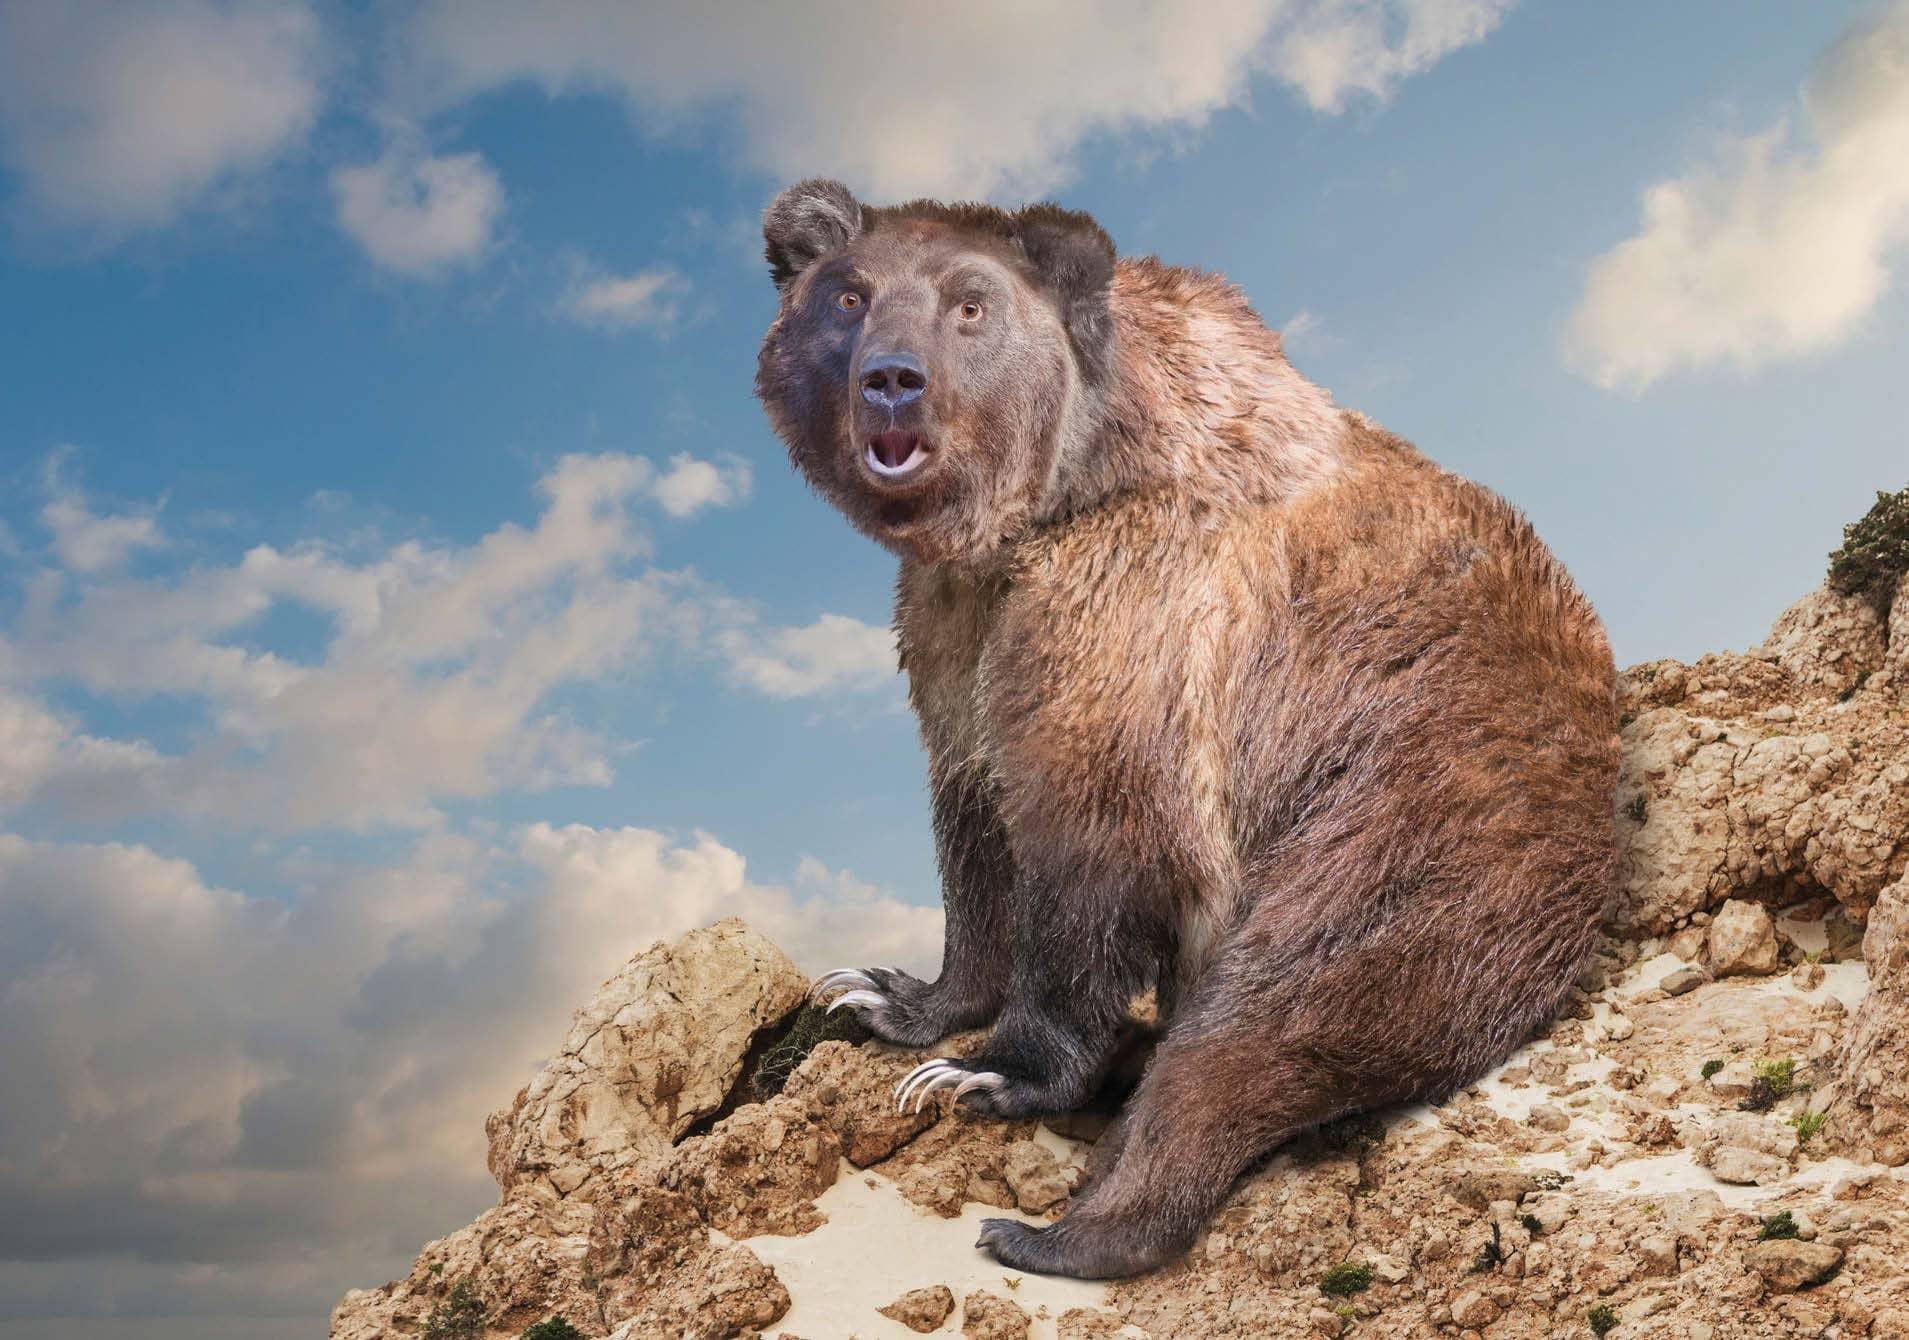 PRACTICAL PORTFOLIO: Bear Market Do's and Don'ts